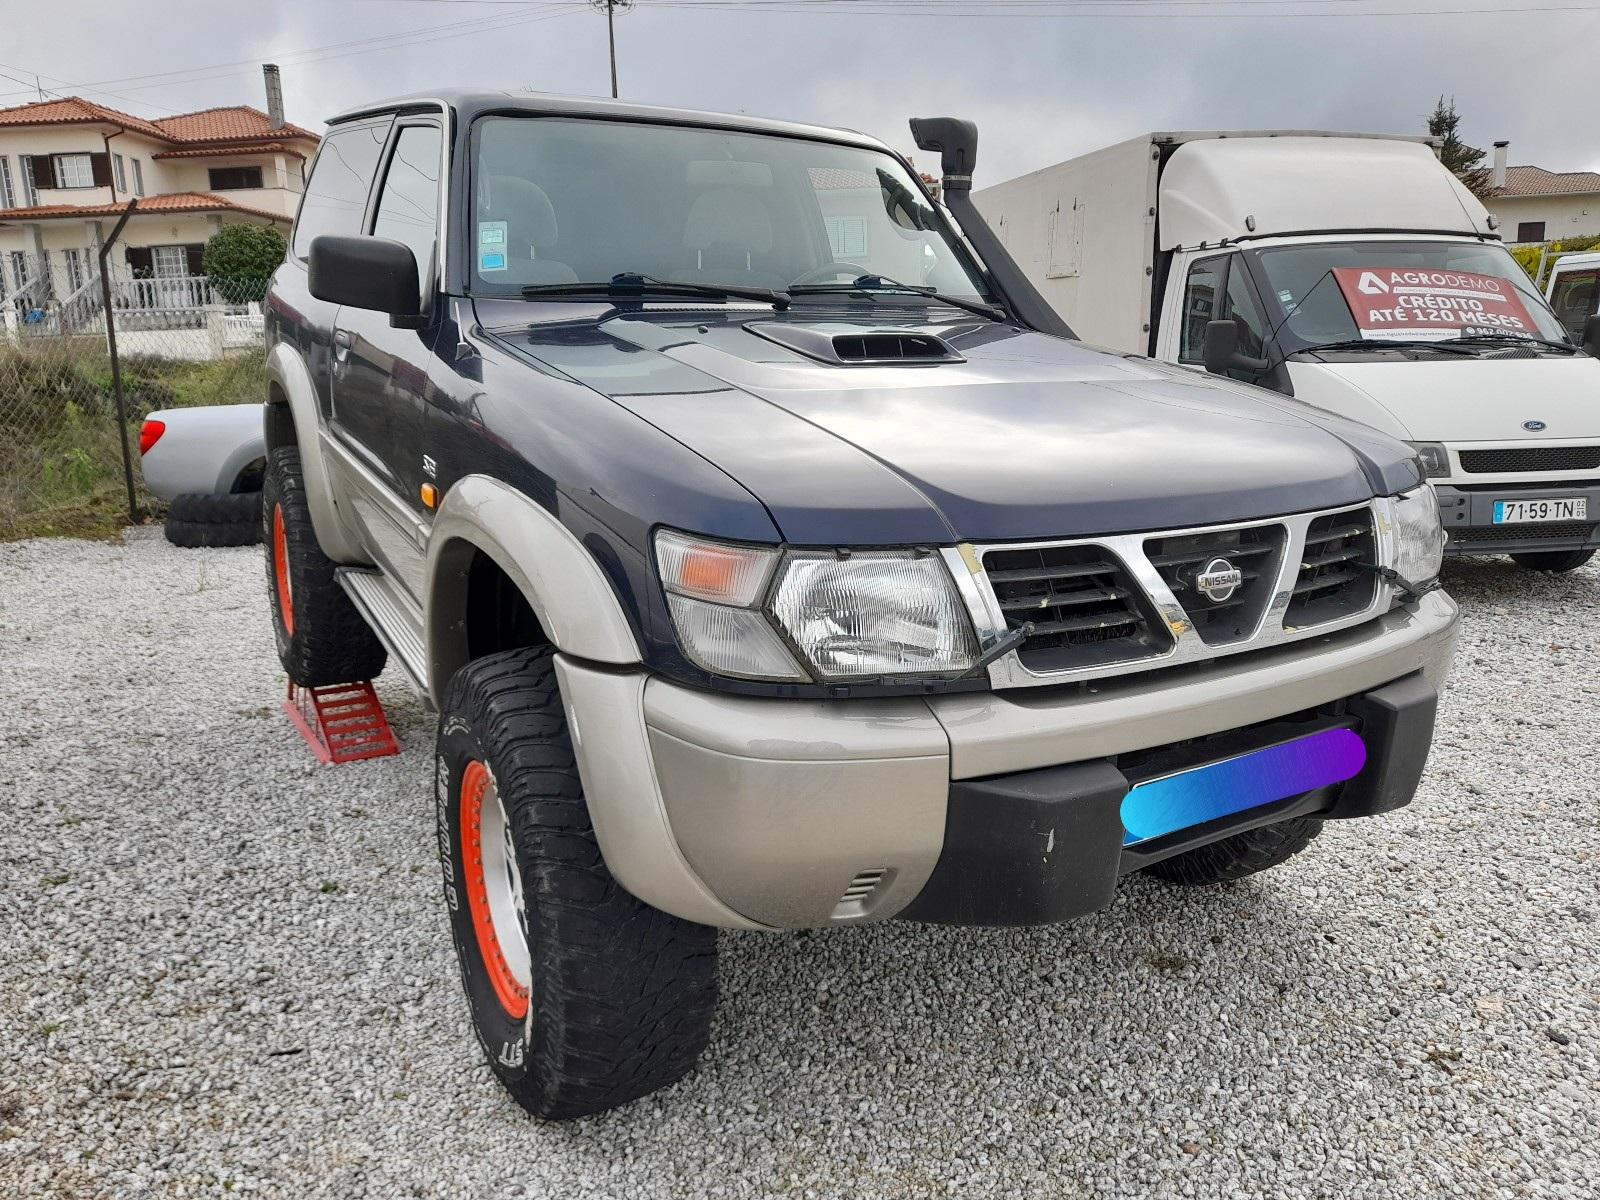 Nissan Patrol GRY61